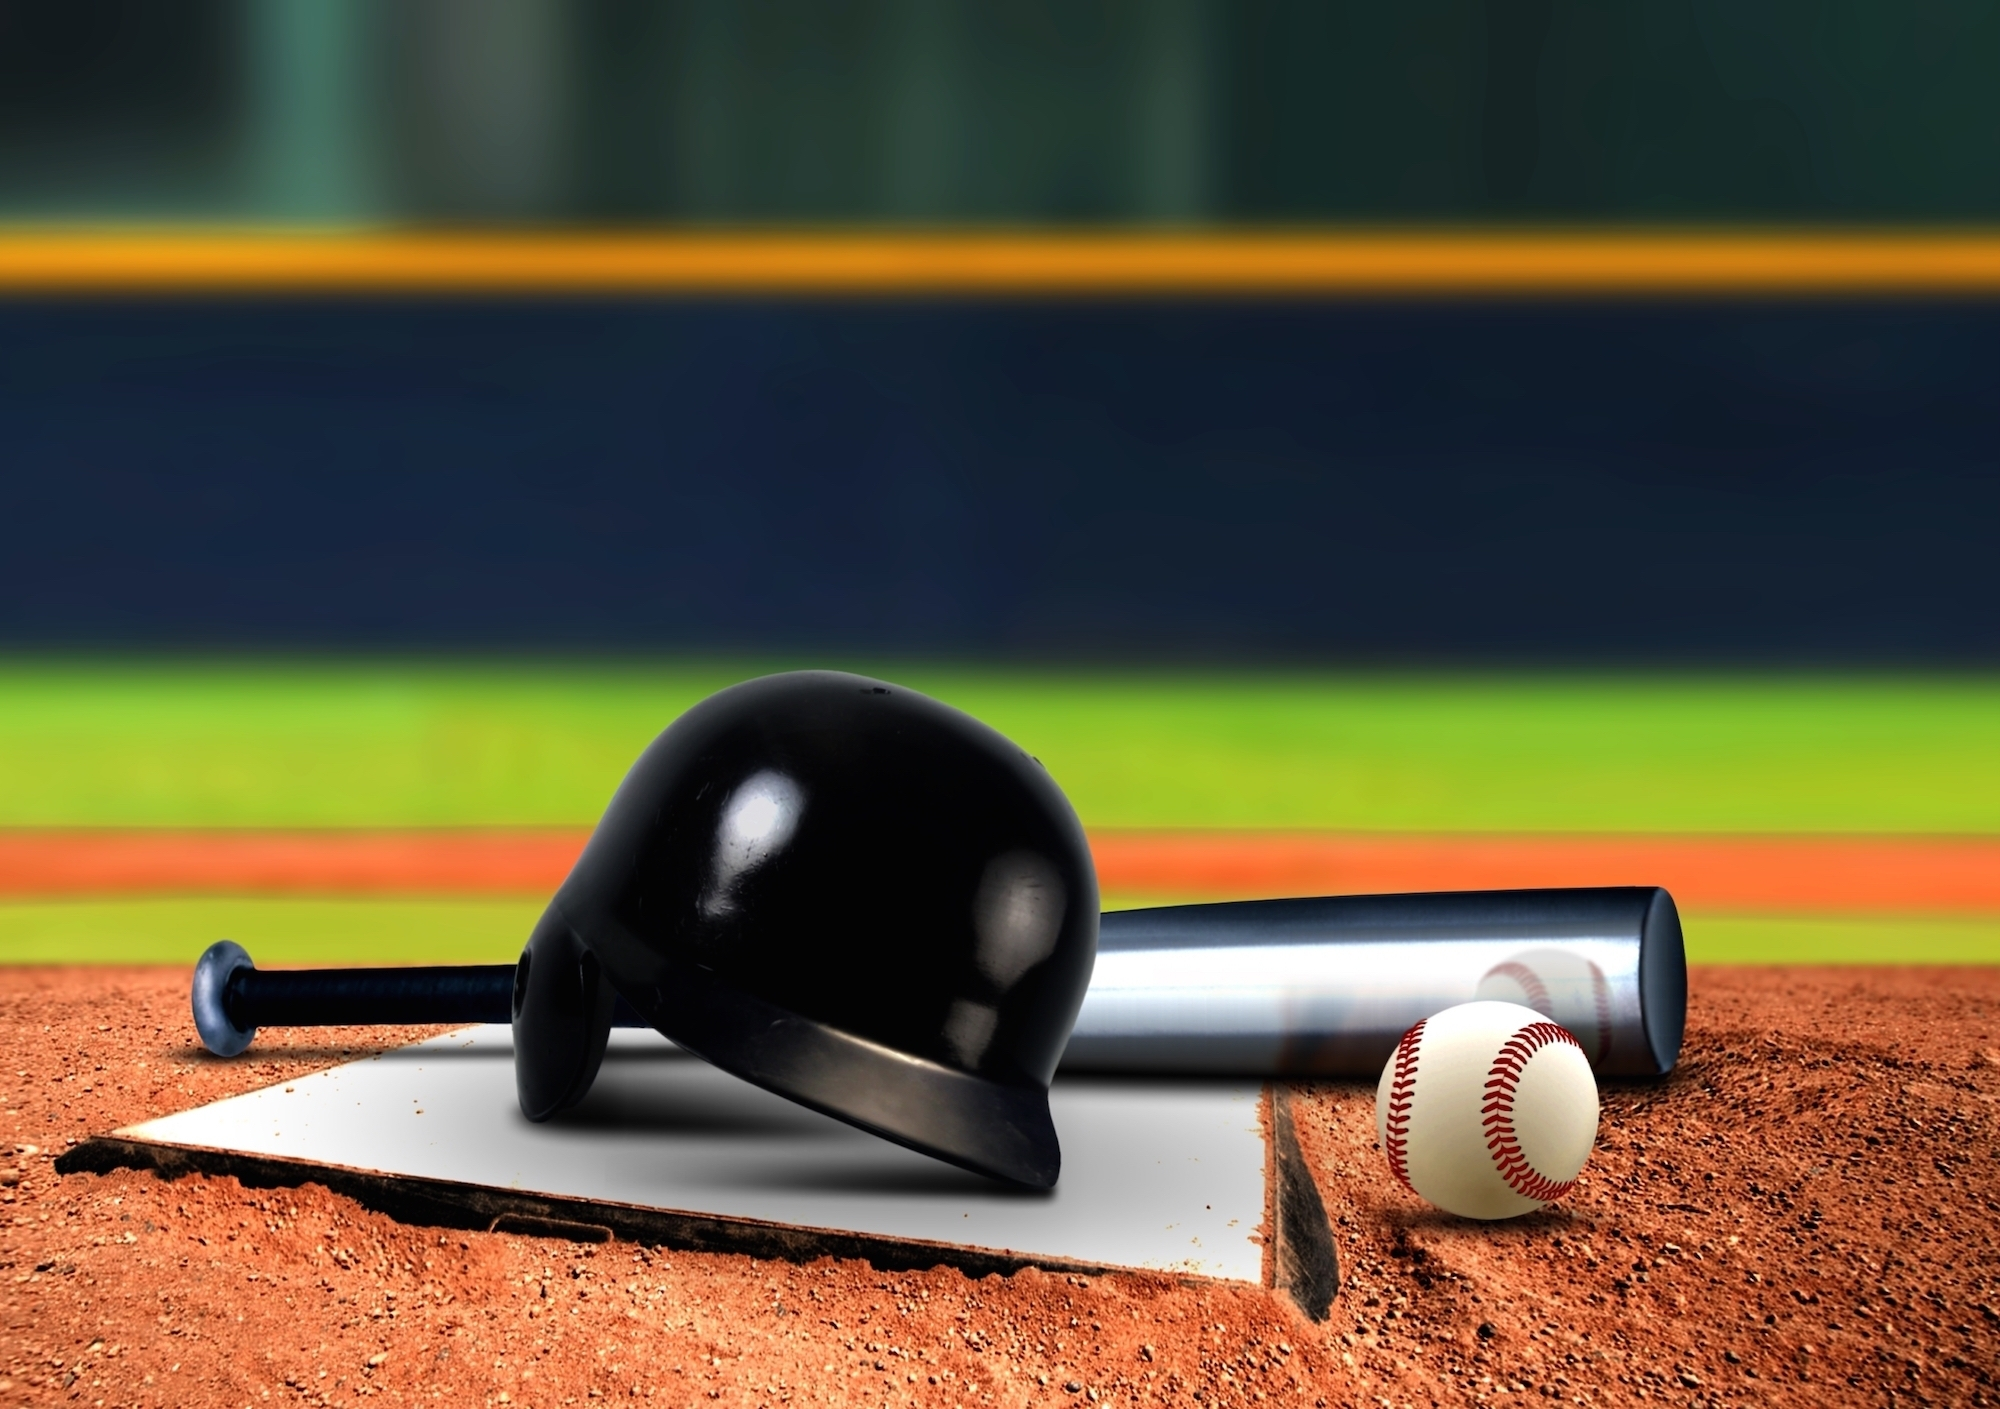 3651b1f41e1a83cc94b0_b84277f5234fbb051920_Baseball_2.jpg